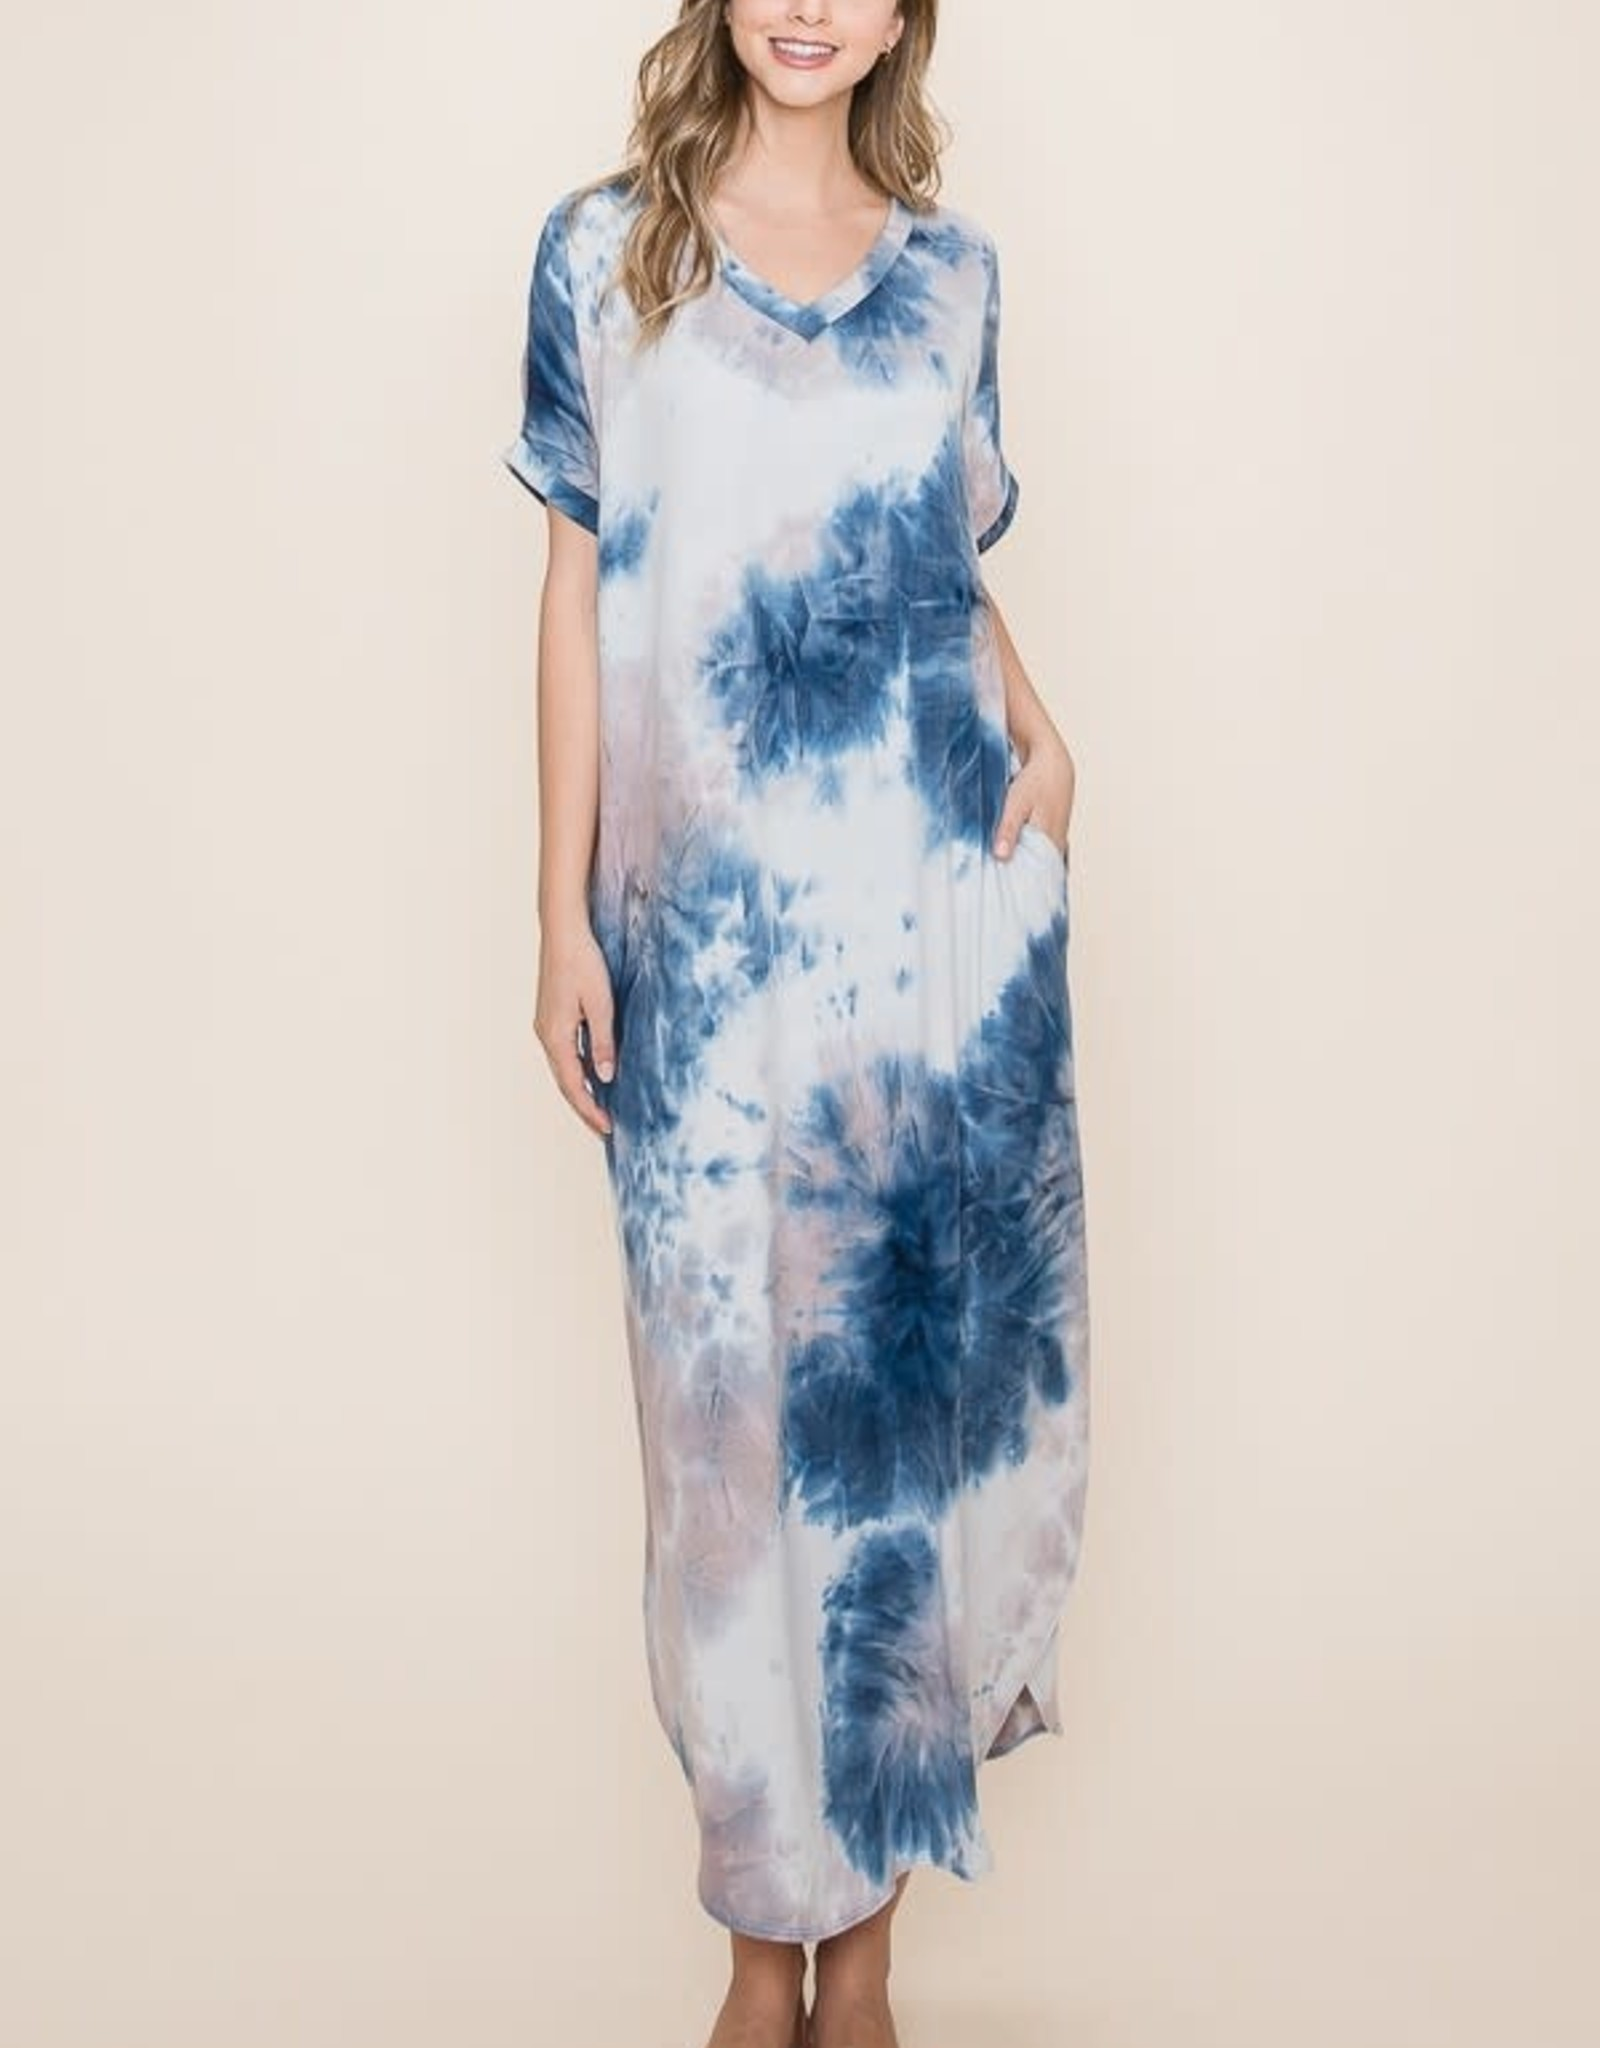 Wink Navy/Grey tie-dye maxi dress